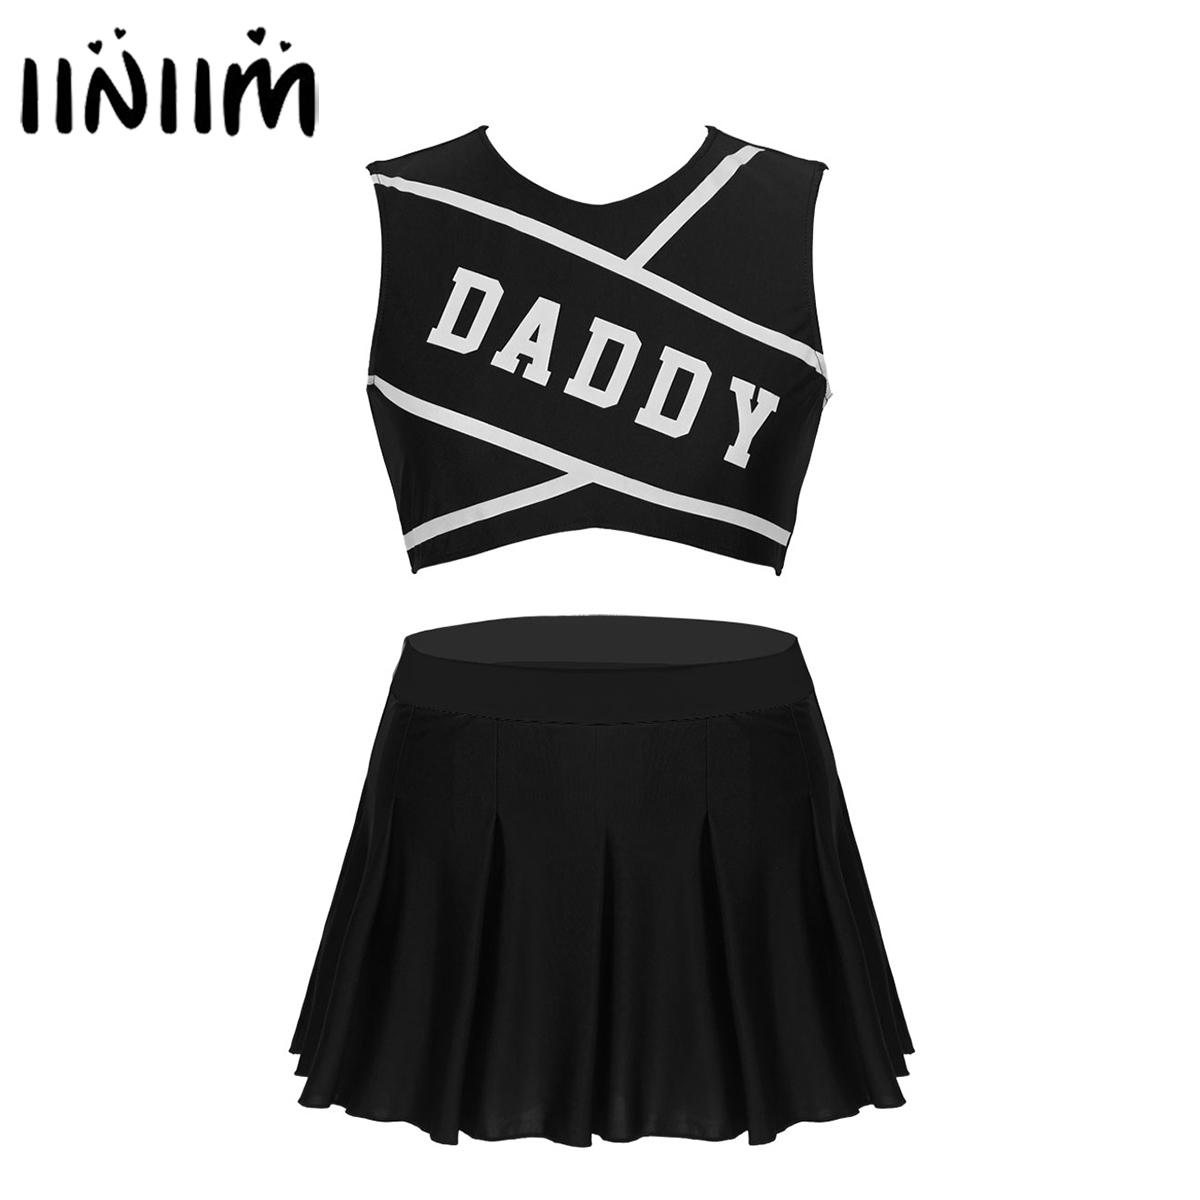 iiniim Womens Adult Schoolgirl Charming Cheerleader DADDY Lover for Halloween Cosplay Costume Crop Top with Mini Pleated Skirt